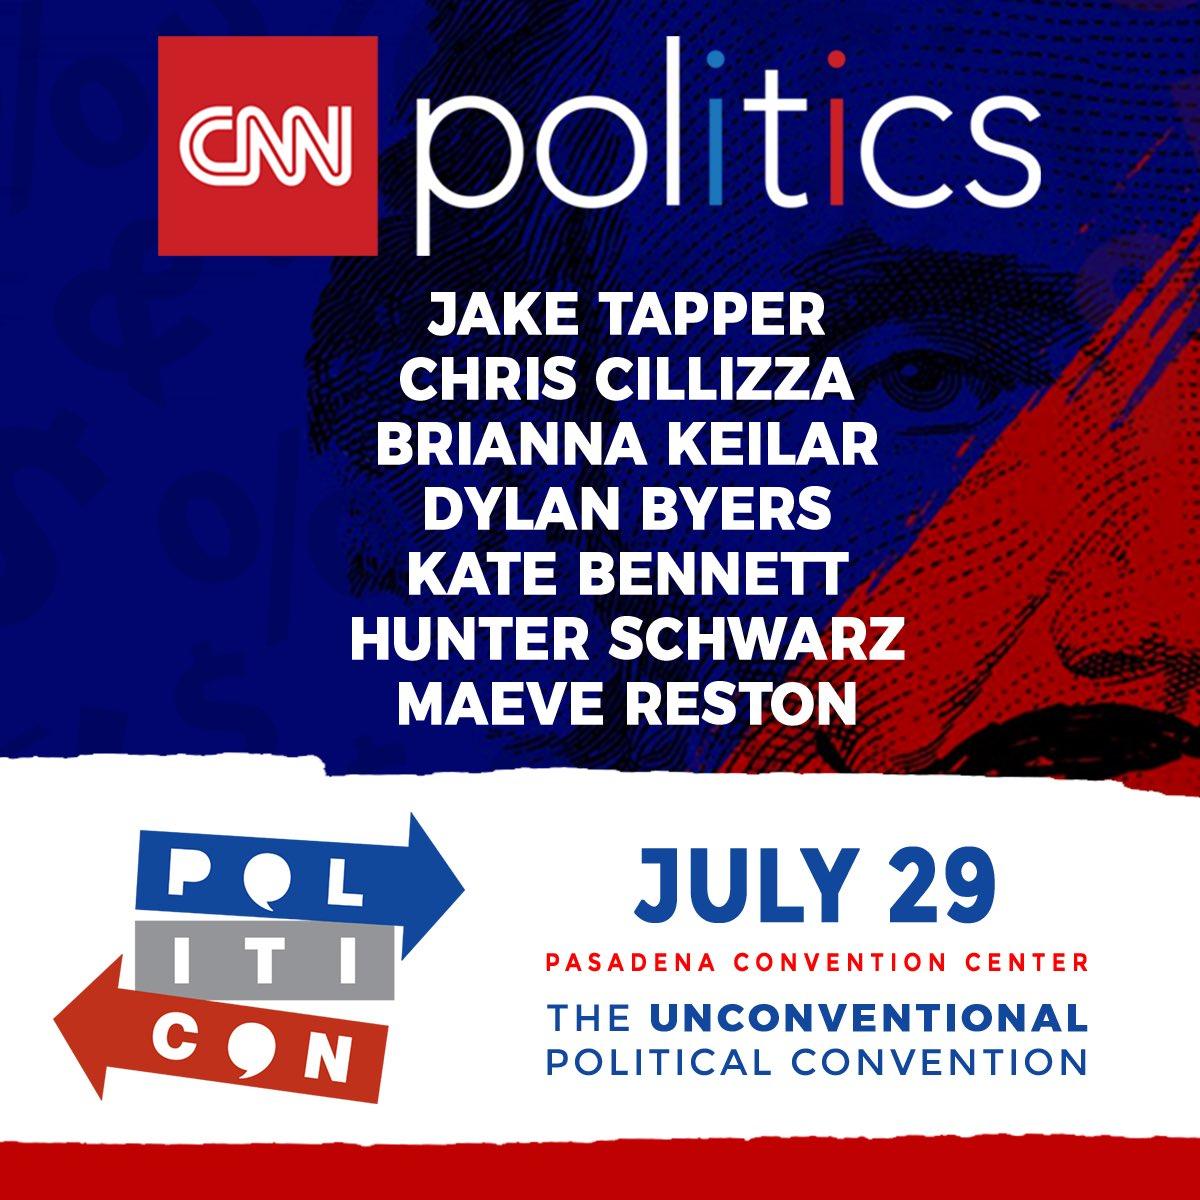 CNN is coming to @Politicon ! Join @jaketapper @TheFix     a@DylanByersn@KateBennett_DCd@hunterschwarz @MaeveRestonme July 29!